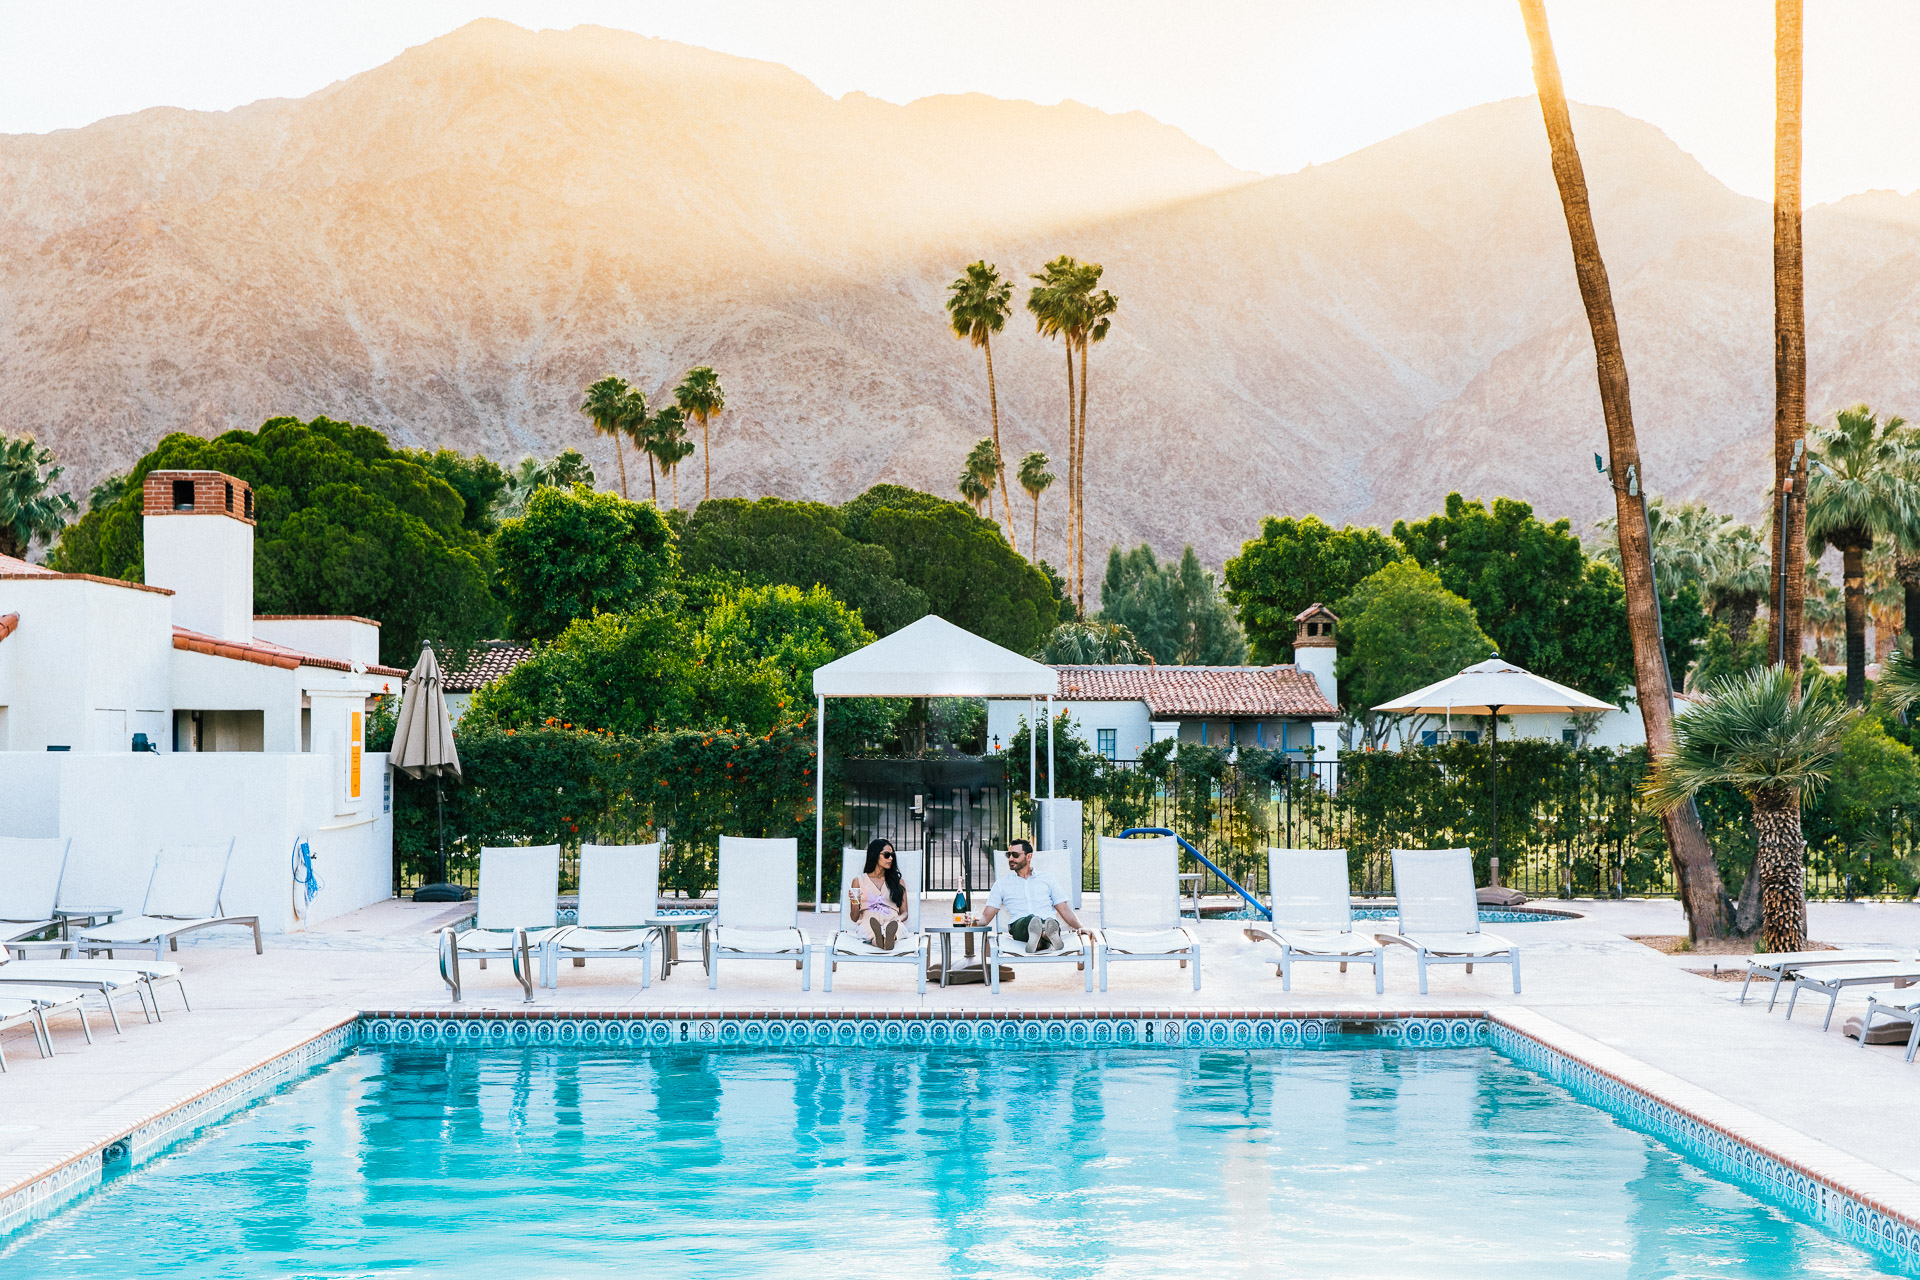 palm-springs-california-hotel-lifestyle-photographer-la-quinta-resort-club-32.jpg